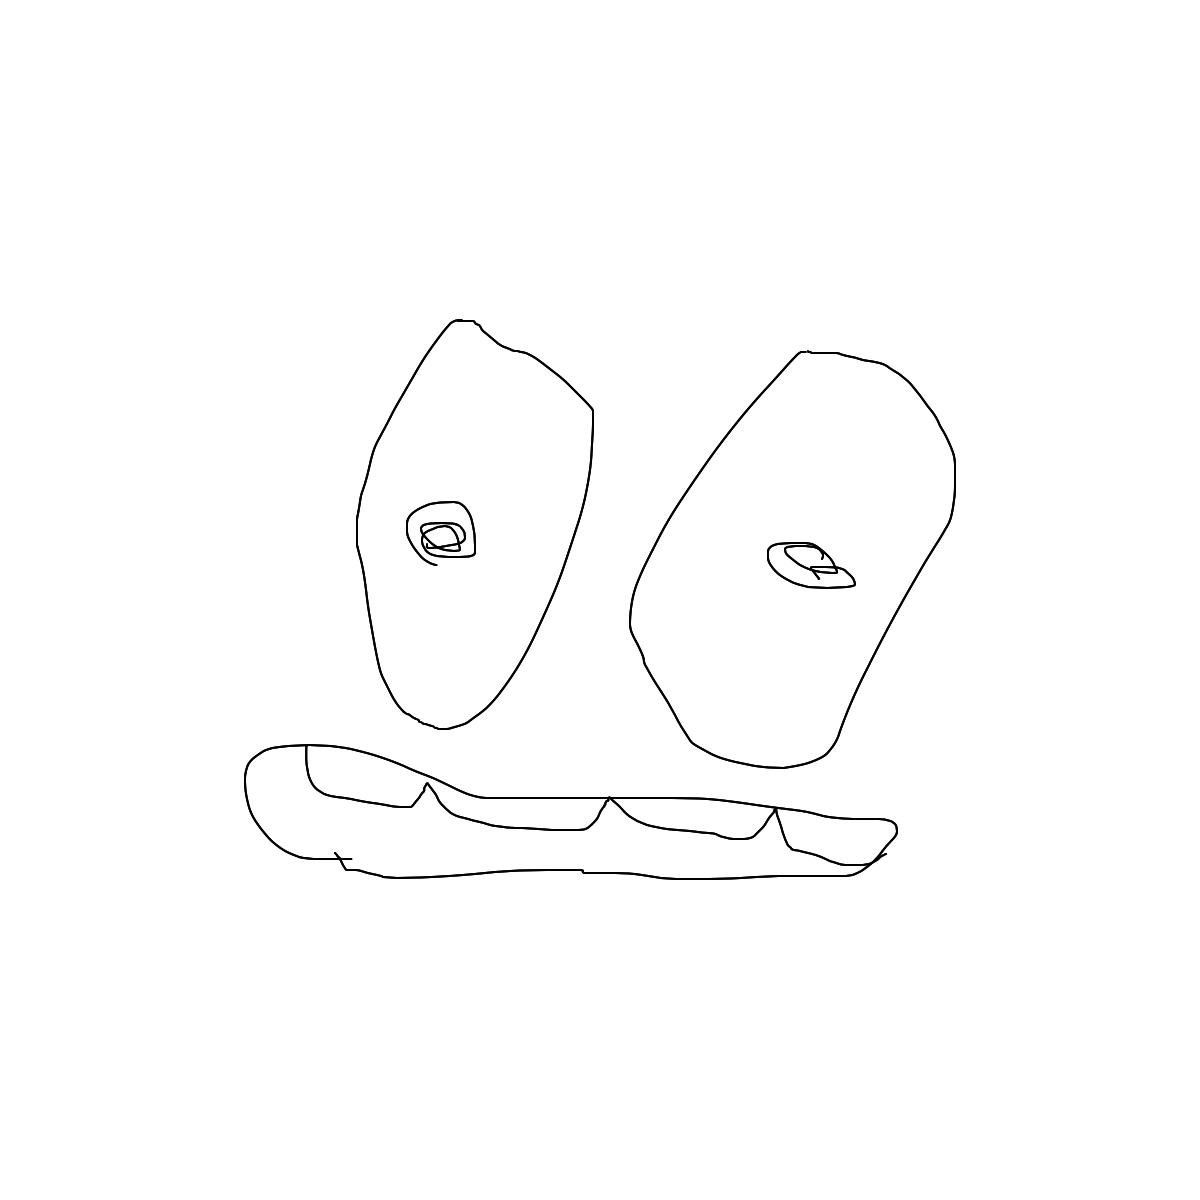 BAAAM drawing#283 lat:38.9860343933105500lng: -77.0978317260742200